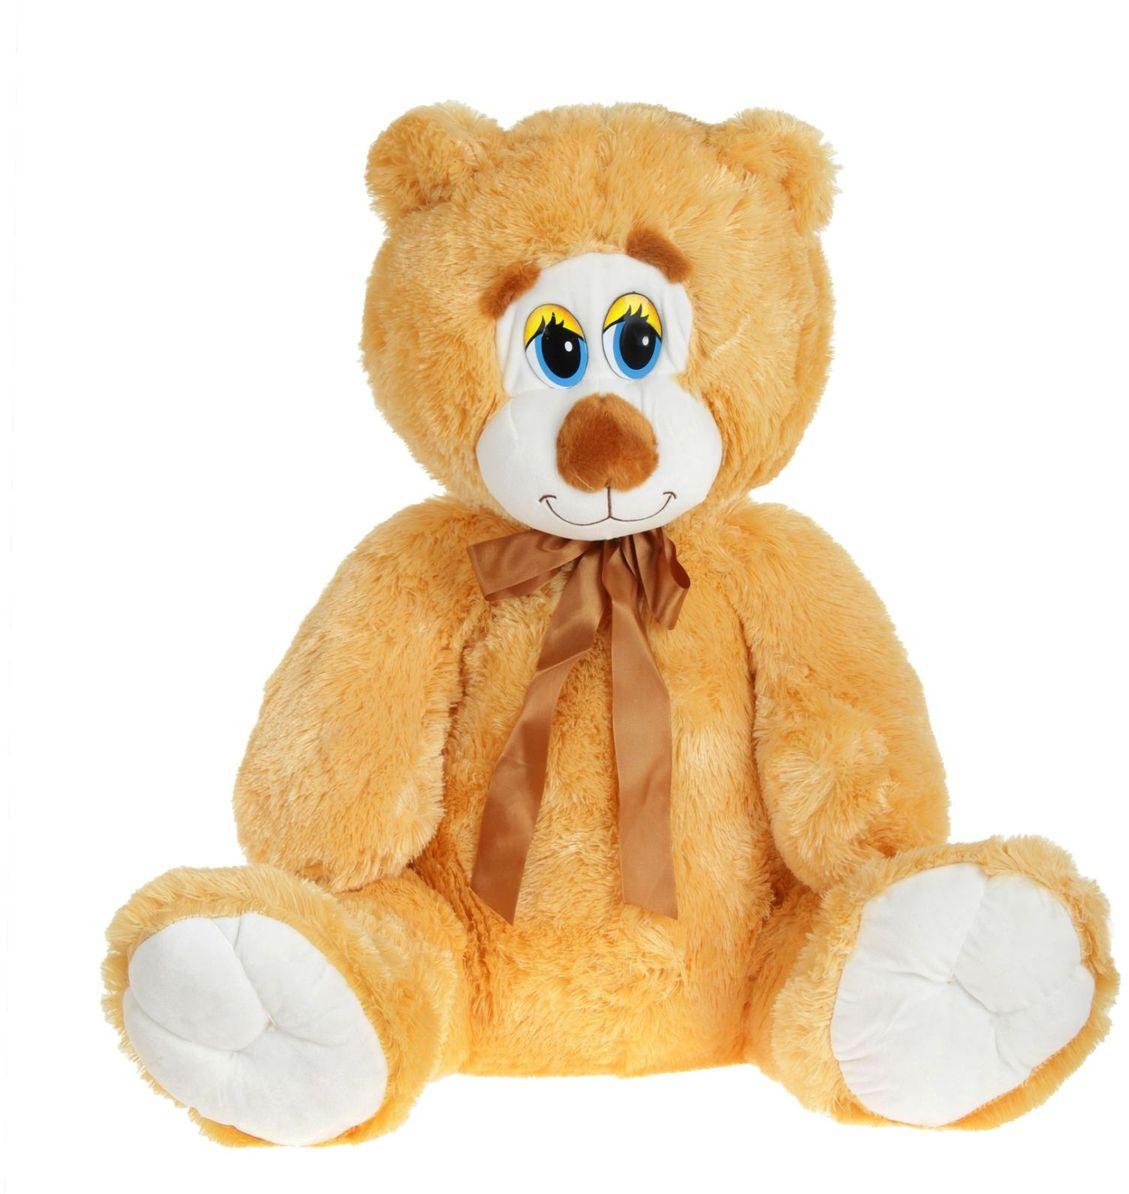 Sima-land Мягкая игрушка Медведь 327541